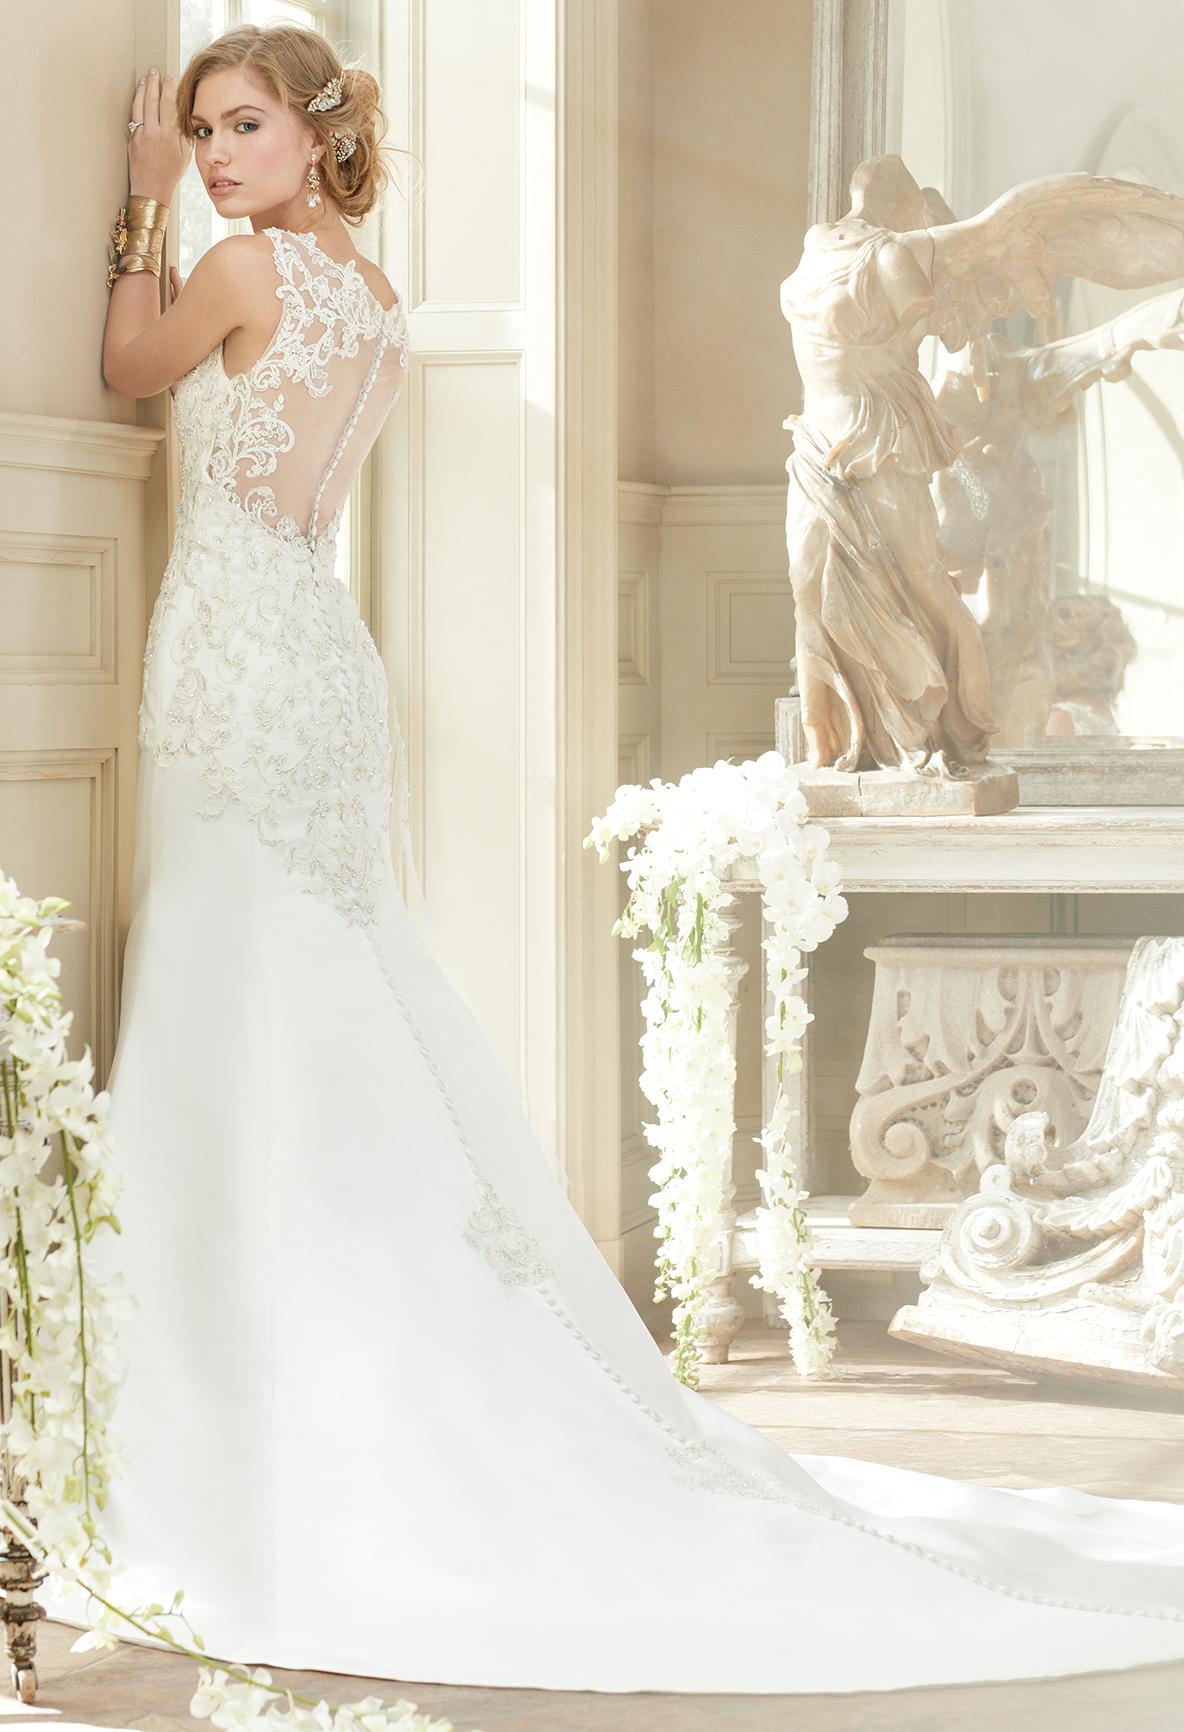 Lace Illusion Back Satin Trumpet Wedding Dress Wedding Dresses Dresses Trumpet Wedding Dress [ 1732 x 1184 Pixel ]